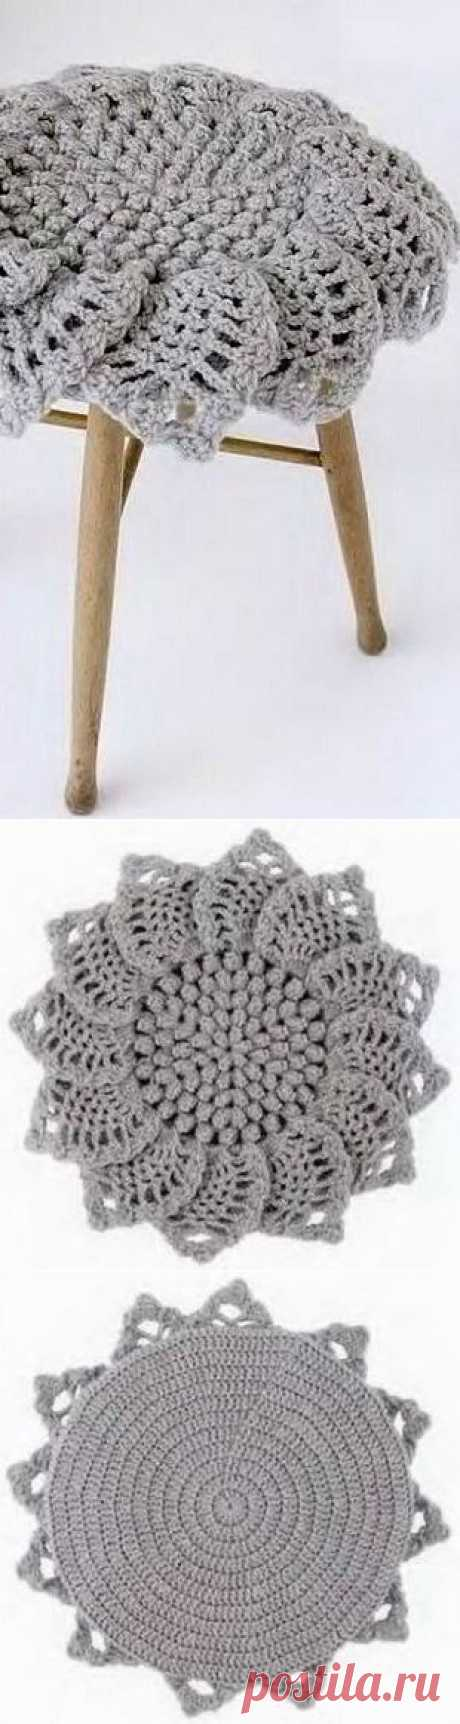 Вязание круглого коврика крючком.